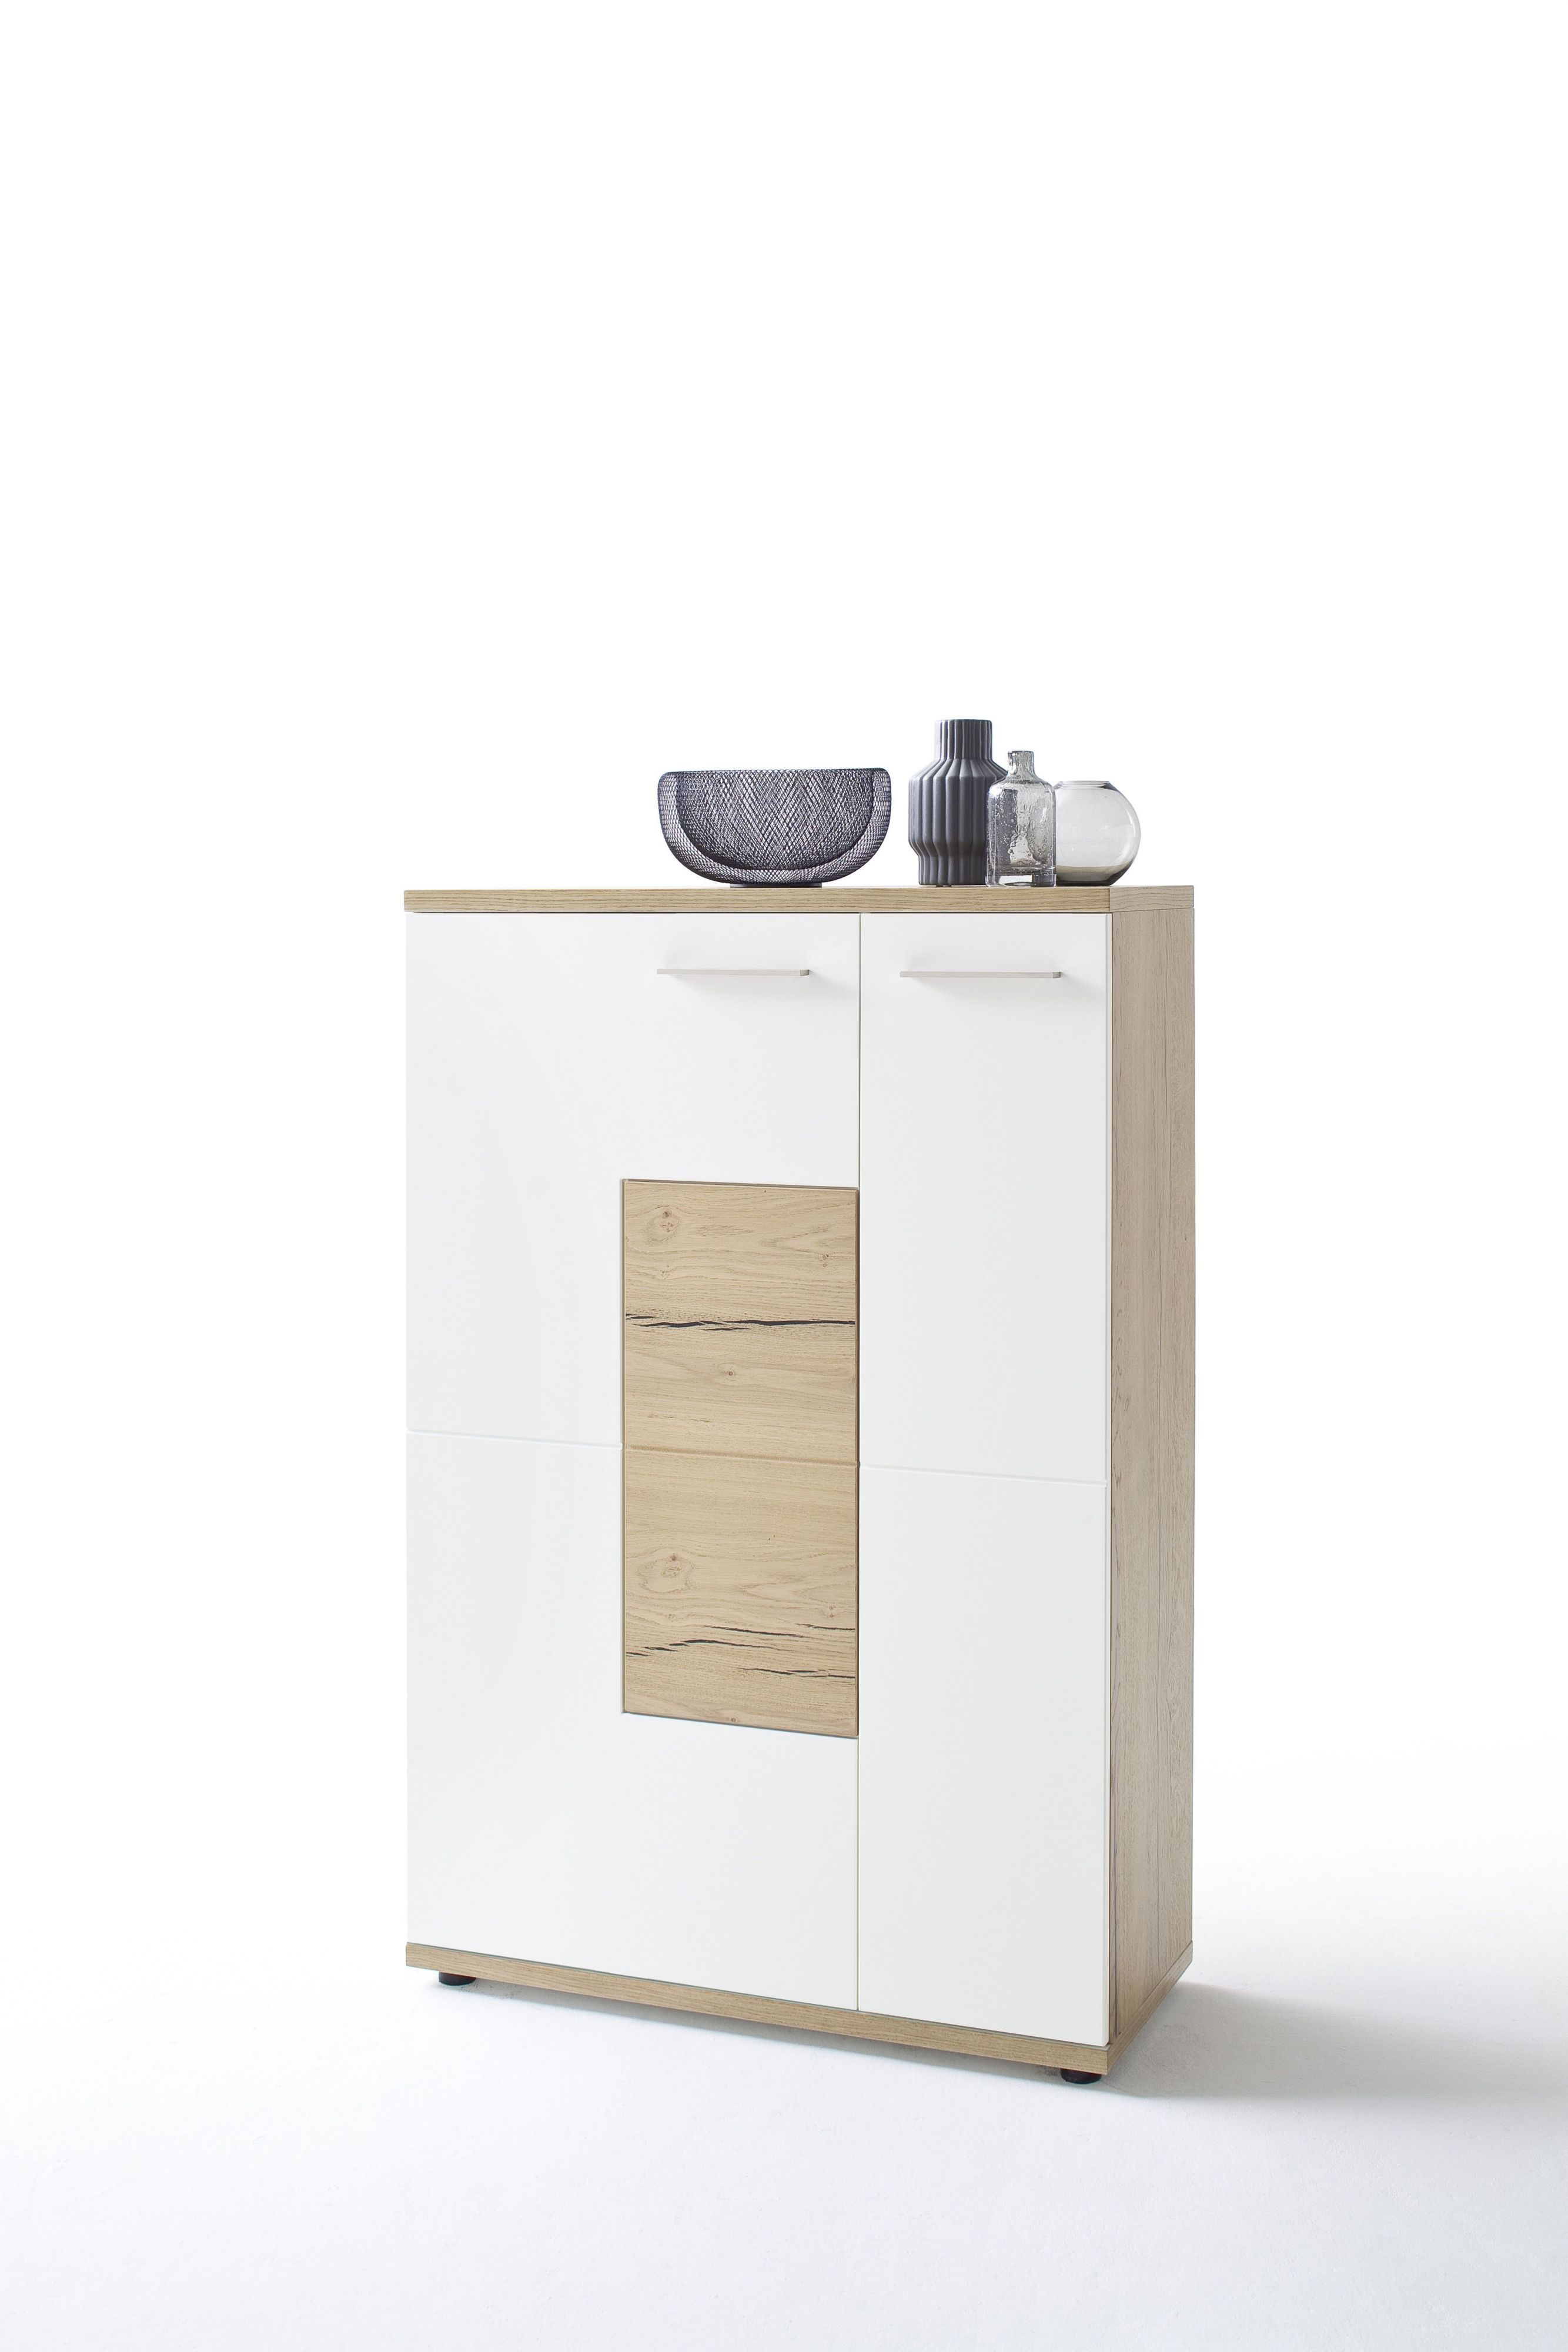 highboard weiss matt crackeiche woody 41 02582 holz modern jetzt bestellen unter https. Black Bedroom Furniture Sets. Home Design Ideas